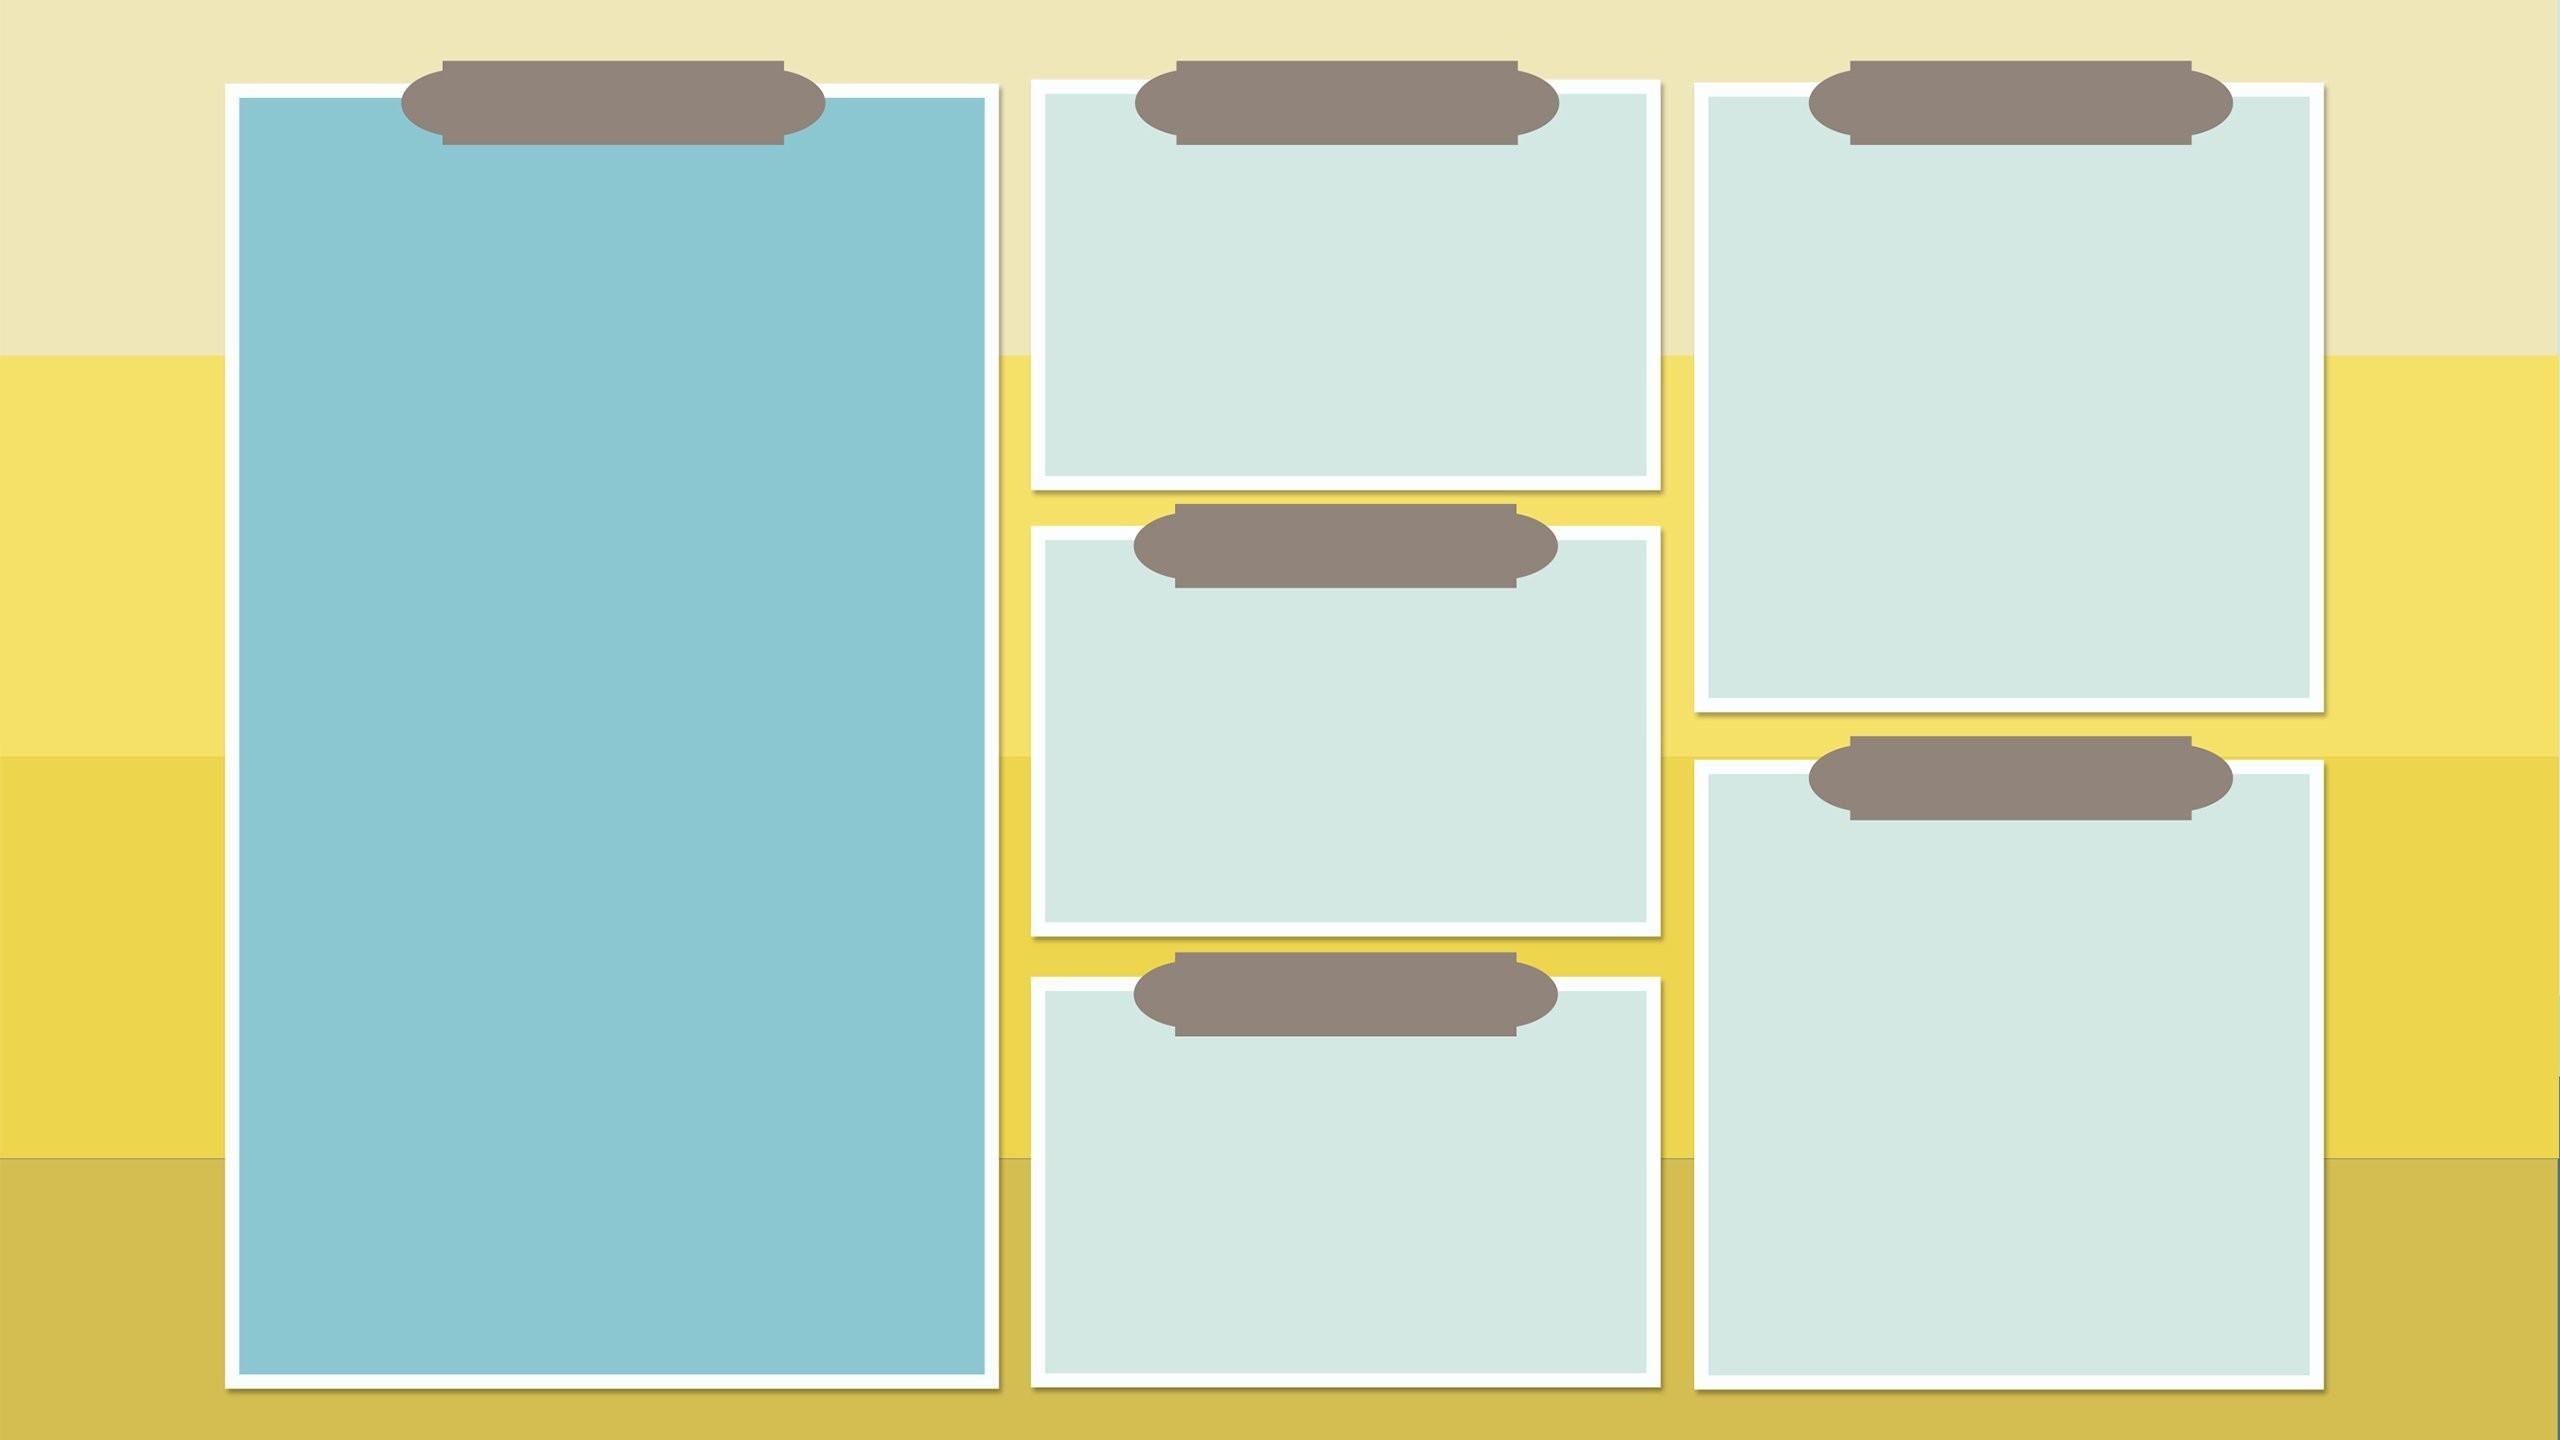 2560x1440 Desktop Icon Organizer Wallpaper Main